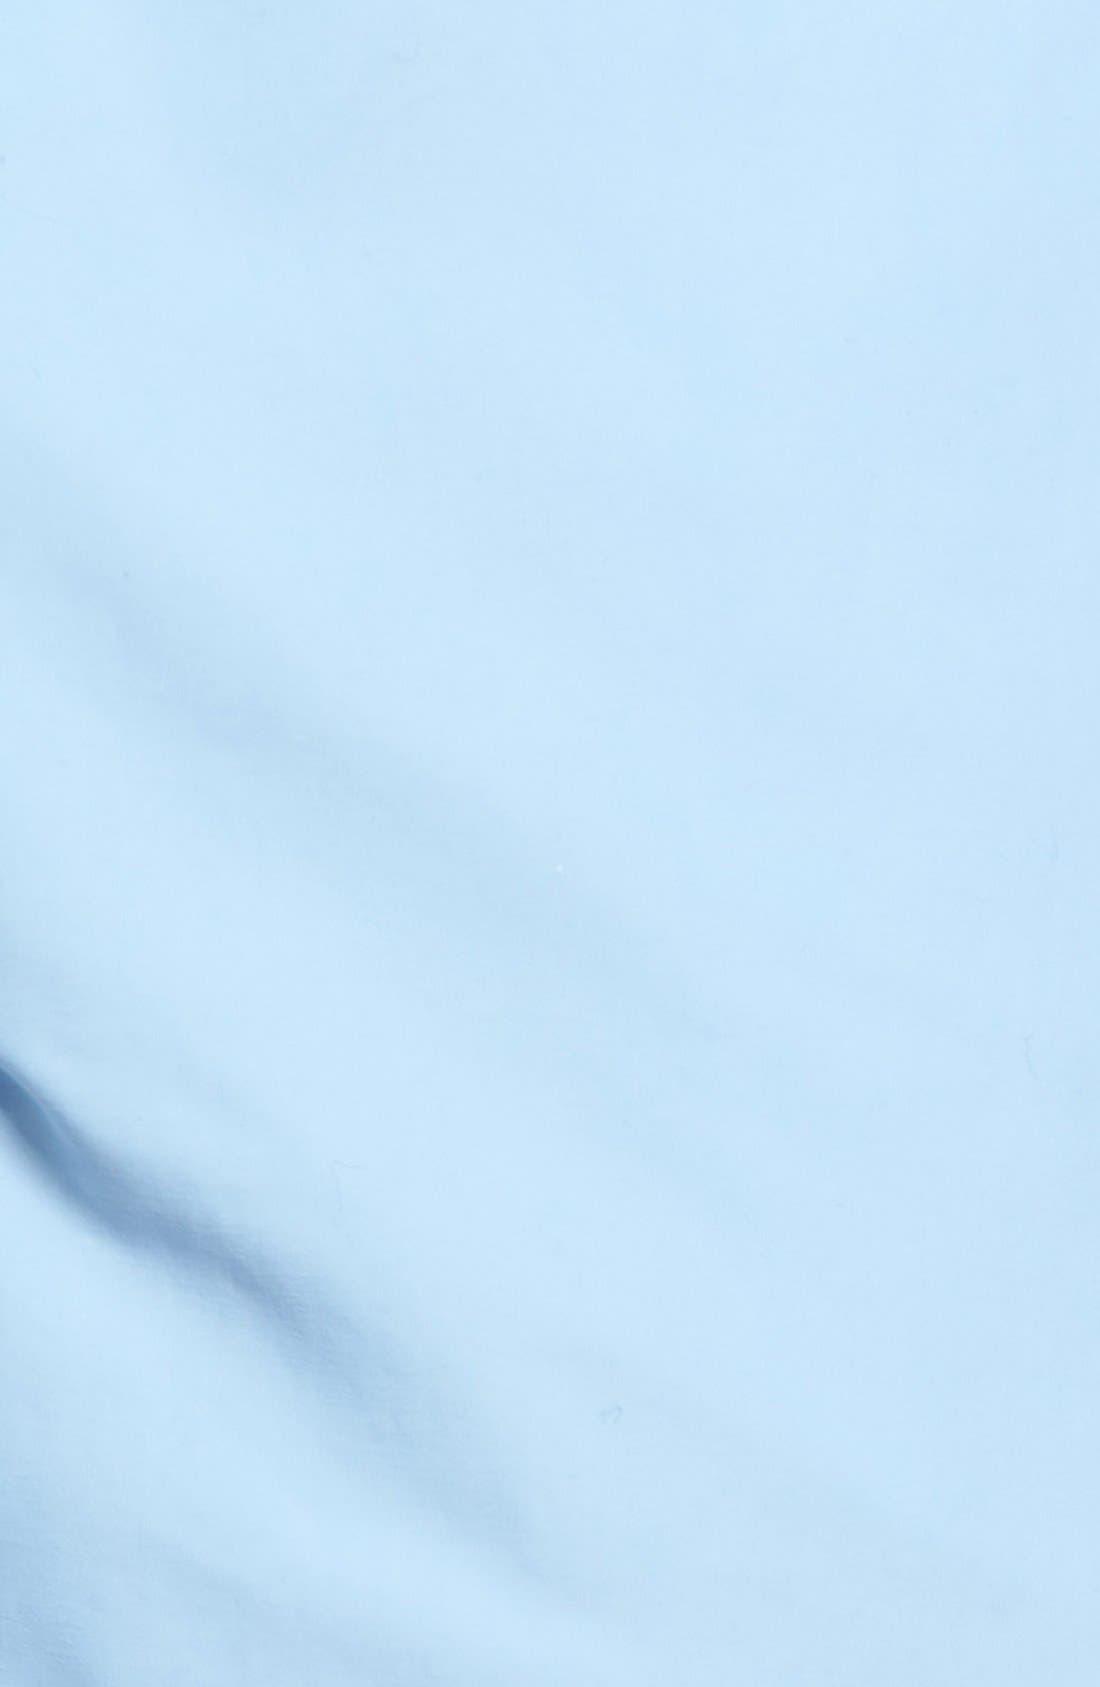 Coral Water Reactive Swim Trunks,                             Alternate thumbnail 5, color,                             Sky Blue